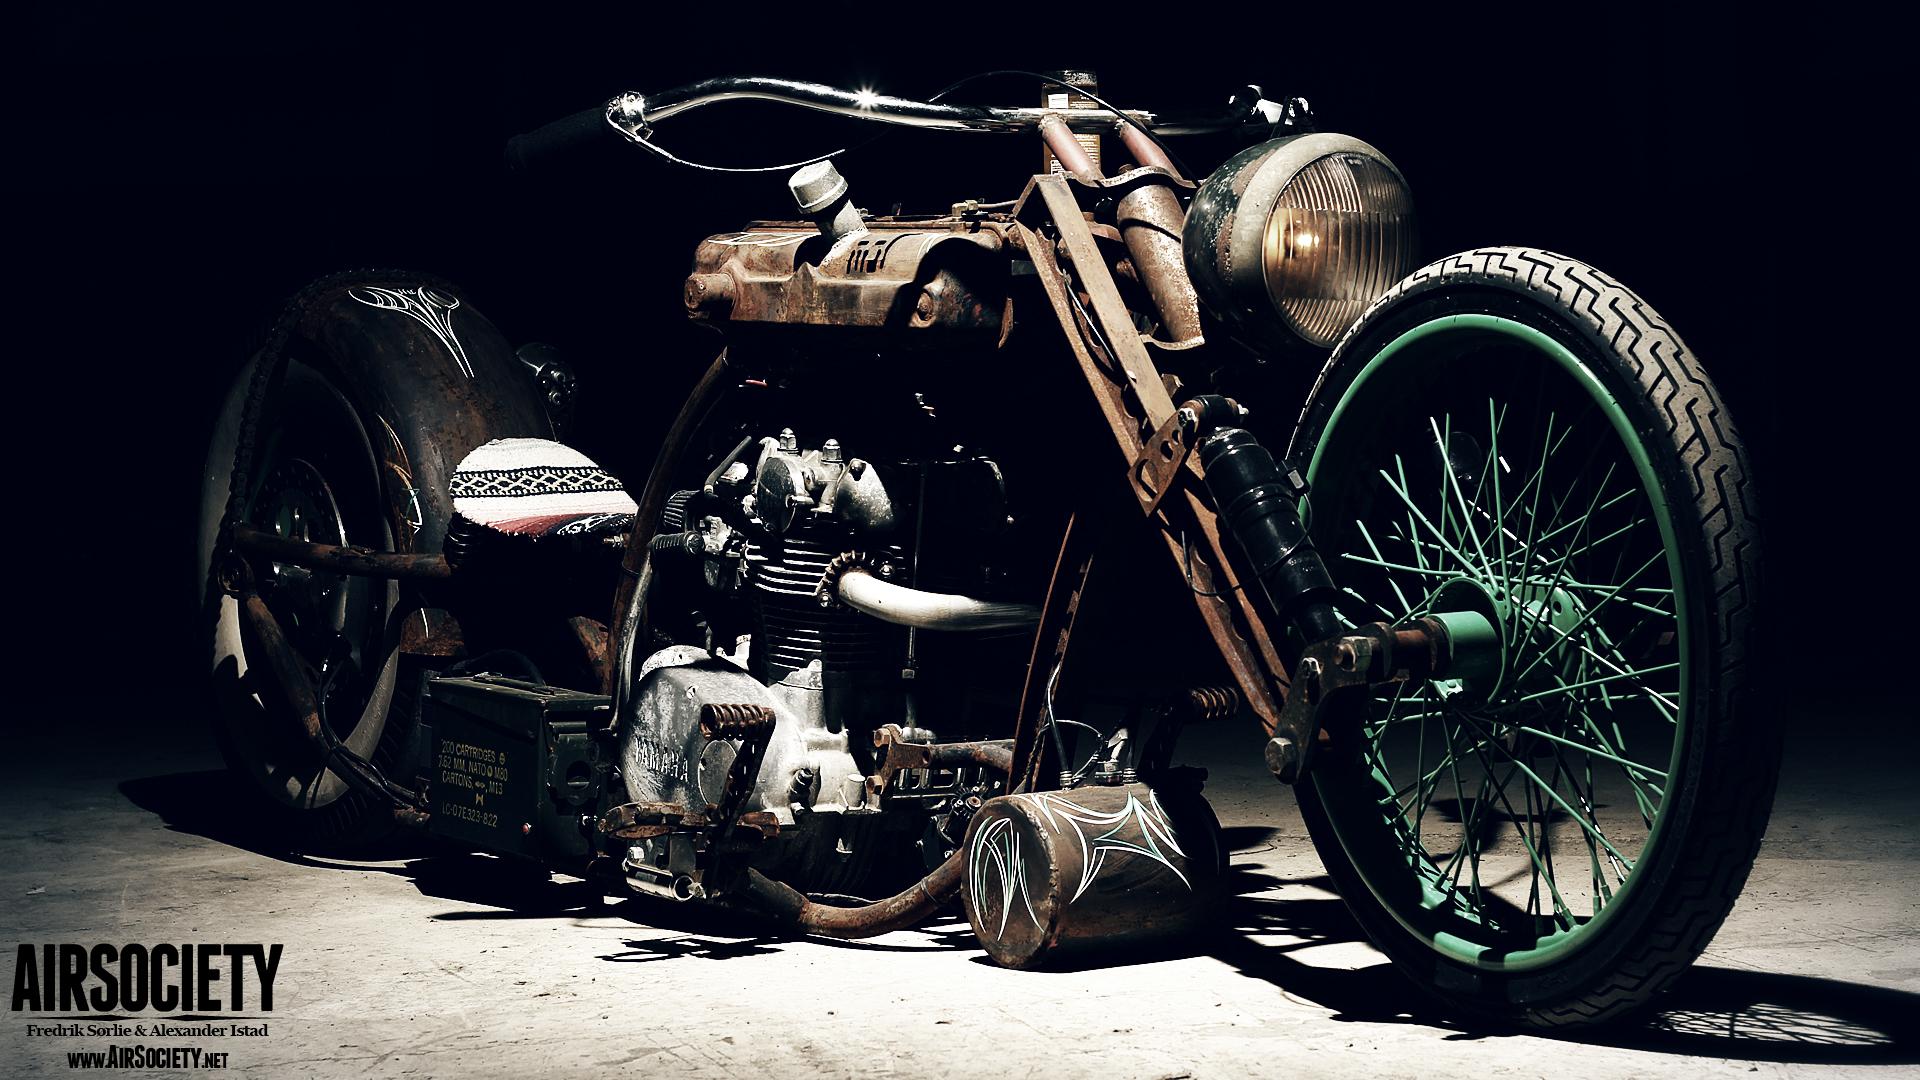 Chopper HD Wallpaper Background Image 1920x1080 ID305745 1920x1080